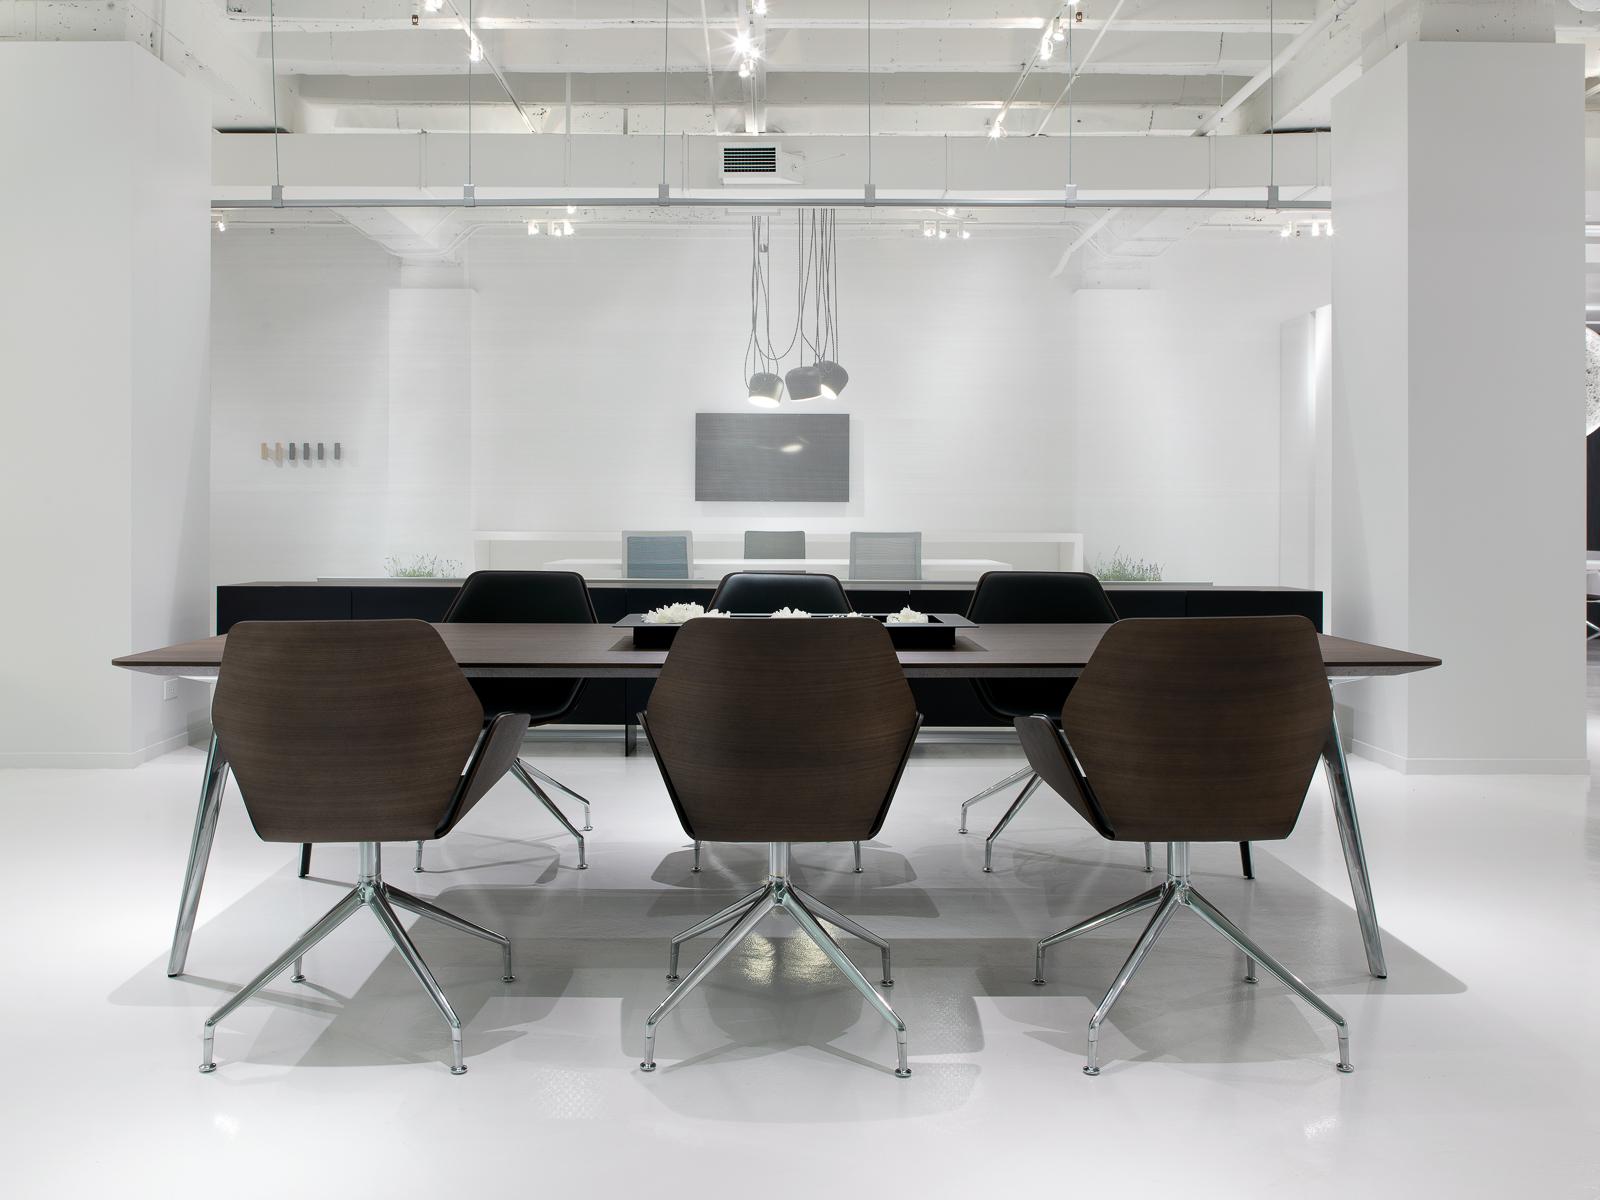 davis_furniture-3.jpg